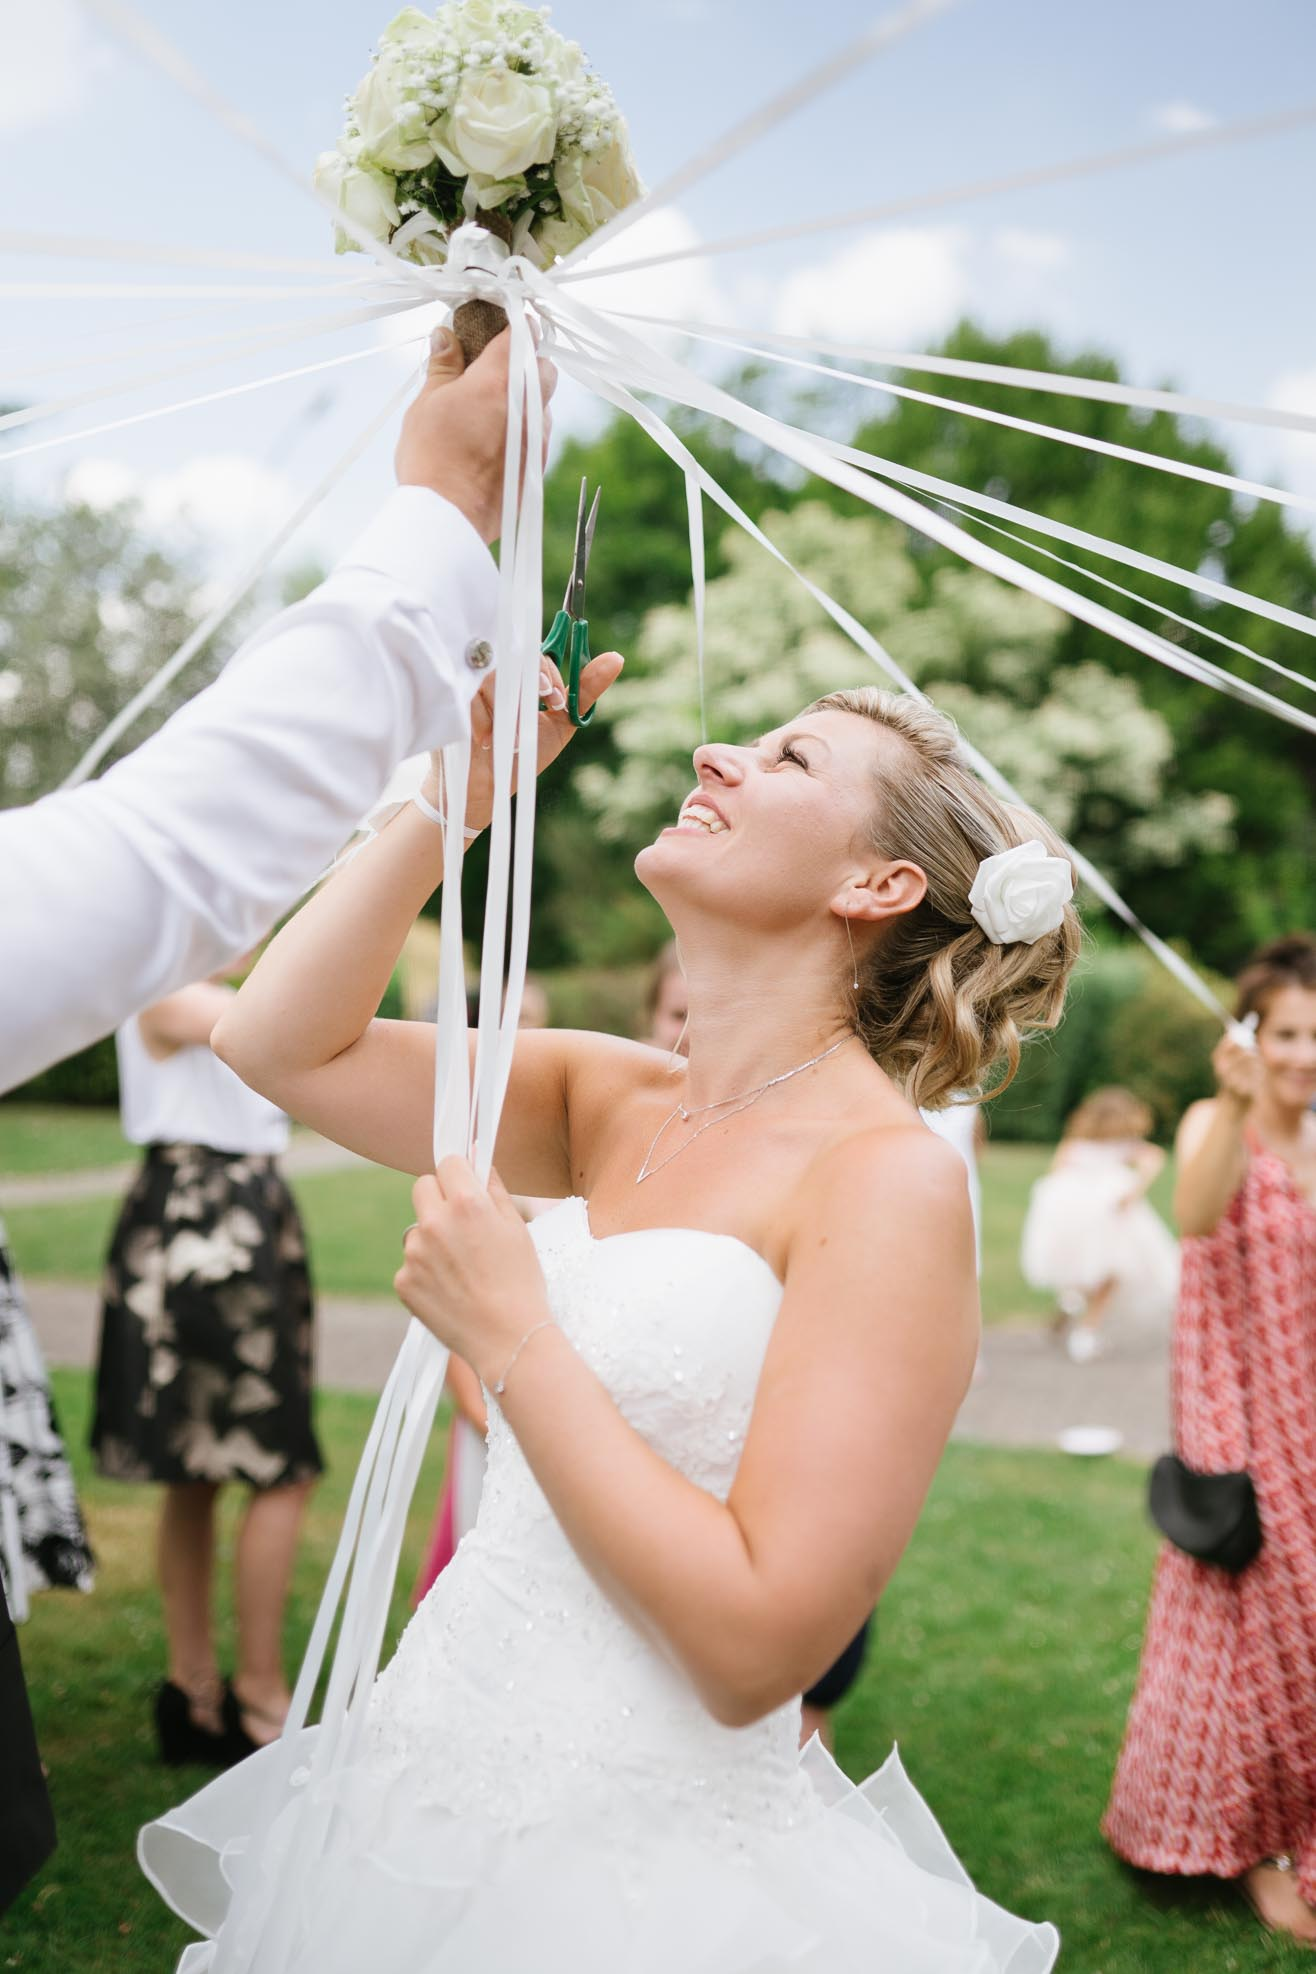 photographe-videaste-bruxelles-mariage-reportage-leleu-6.jpg